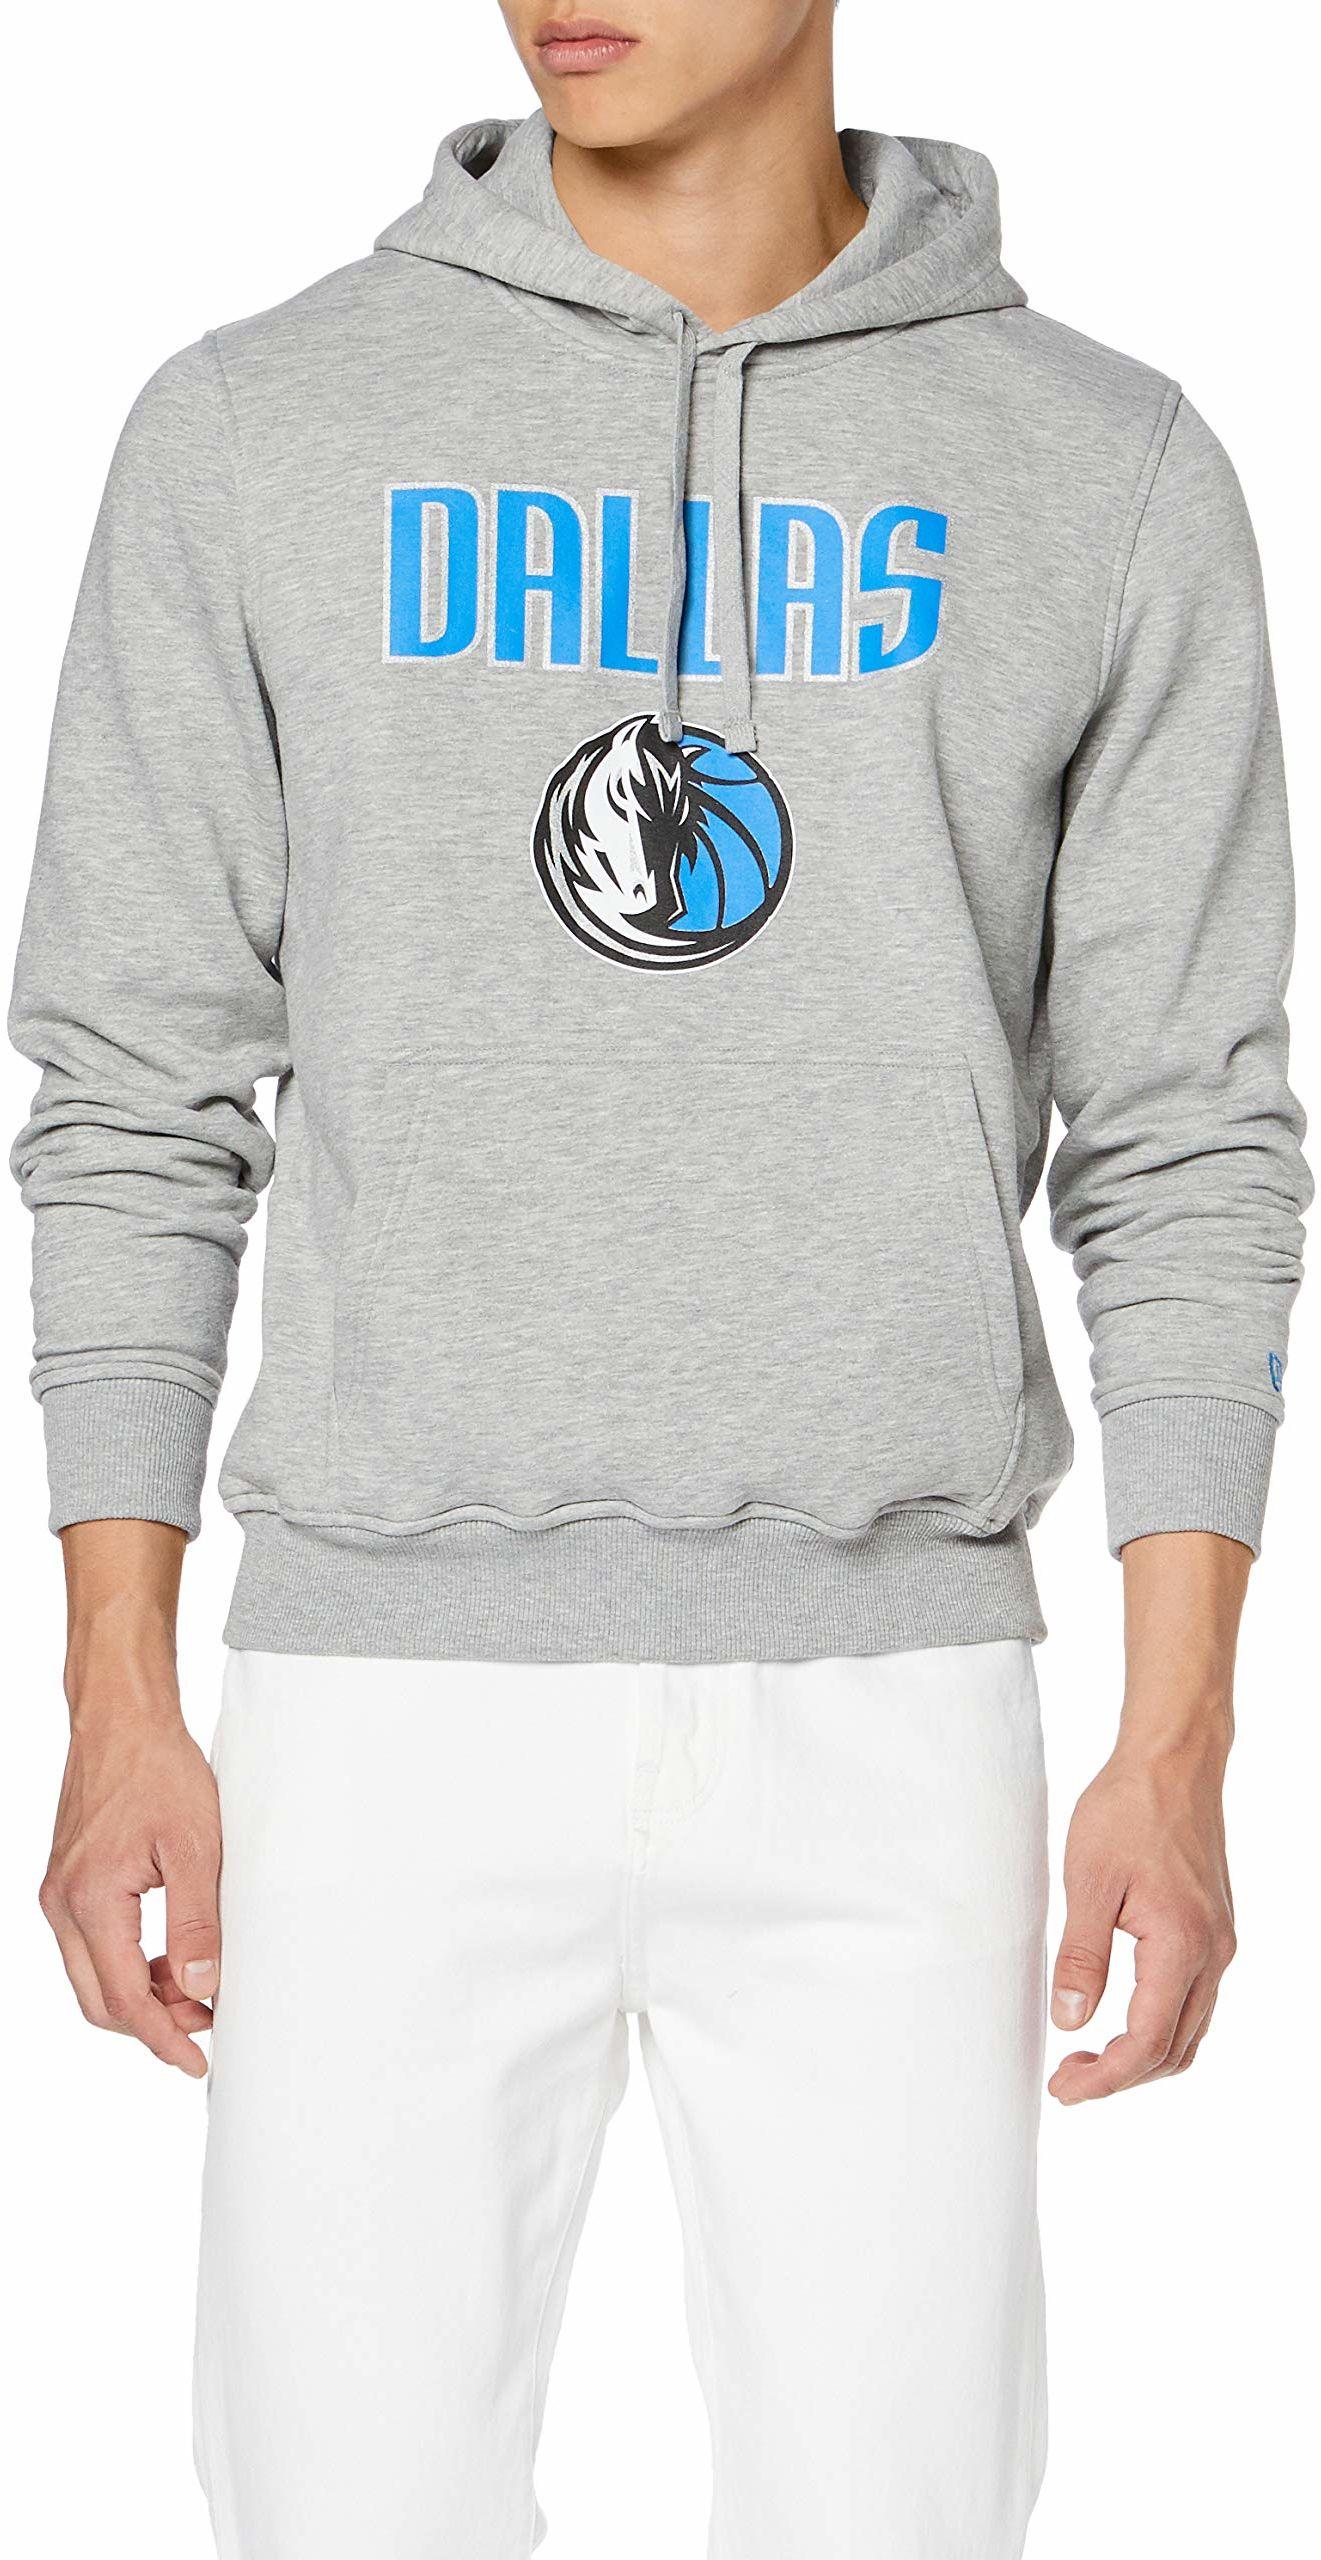 adidas męski pulower z kapturem Boston Celtics męski sweter z kapturem szary XS